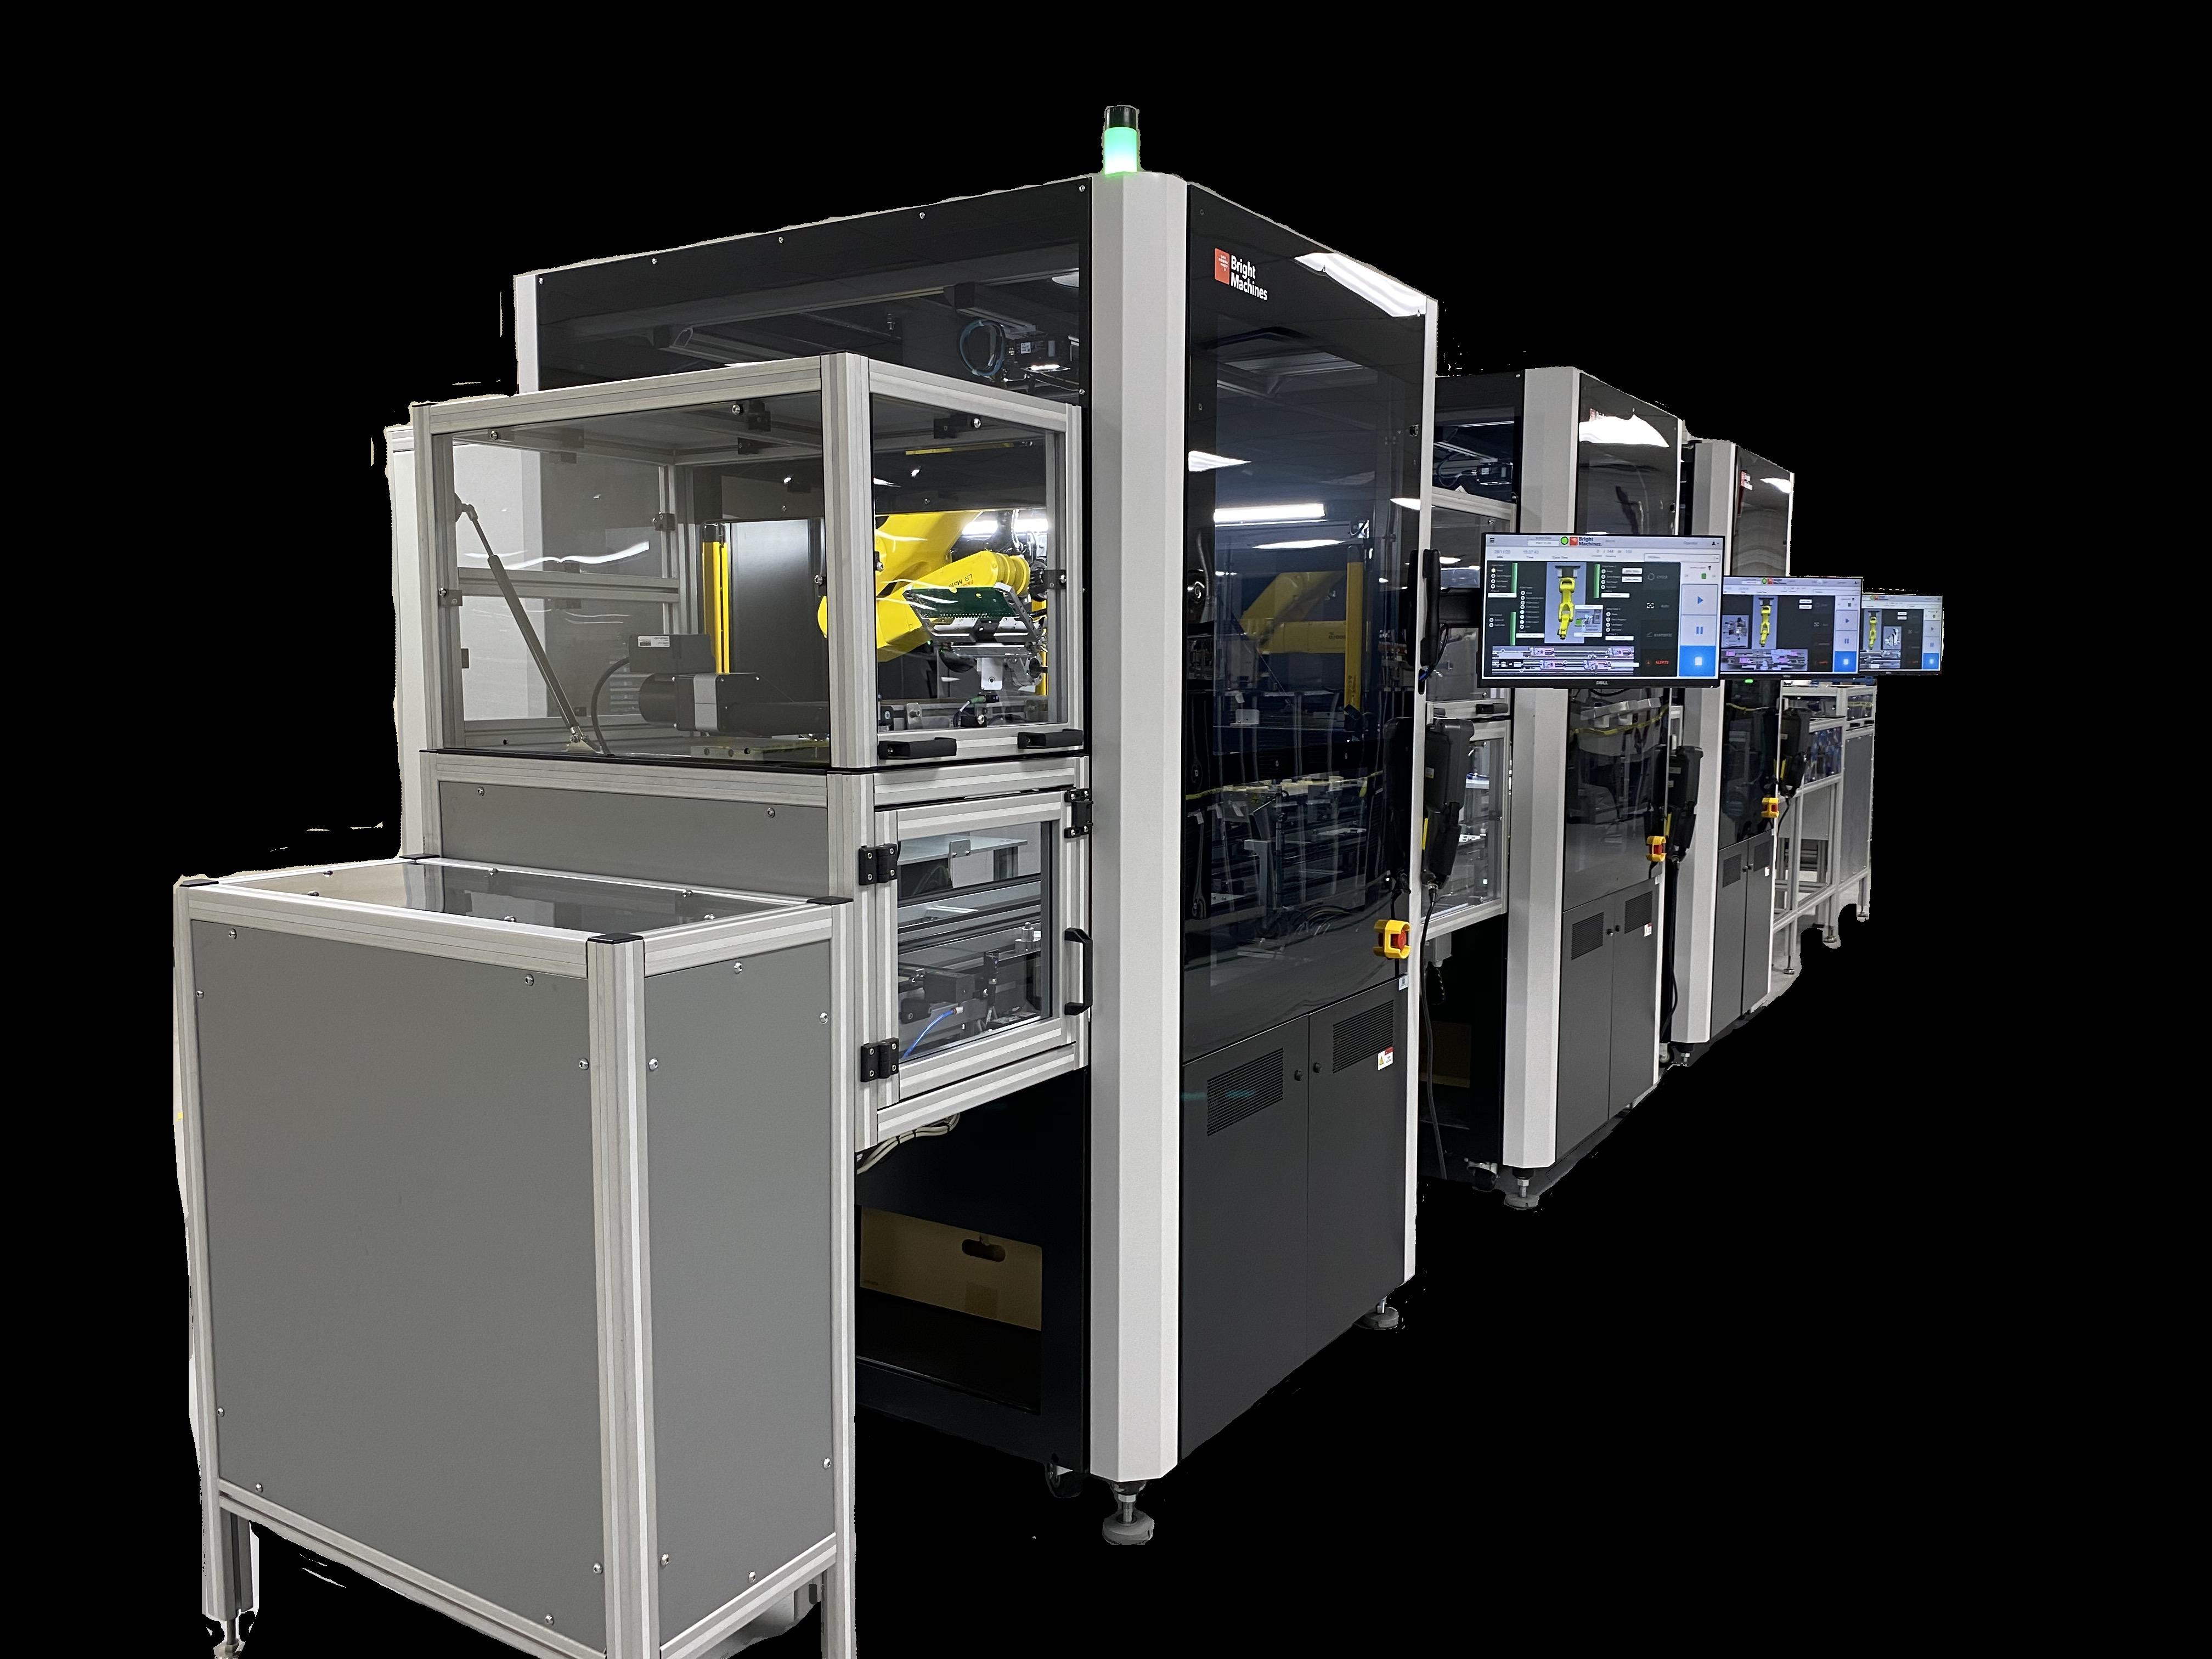 Bright Machines microfactory testing station. Photo via Bright Machines.